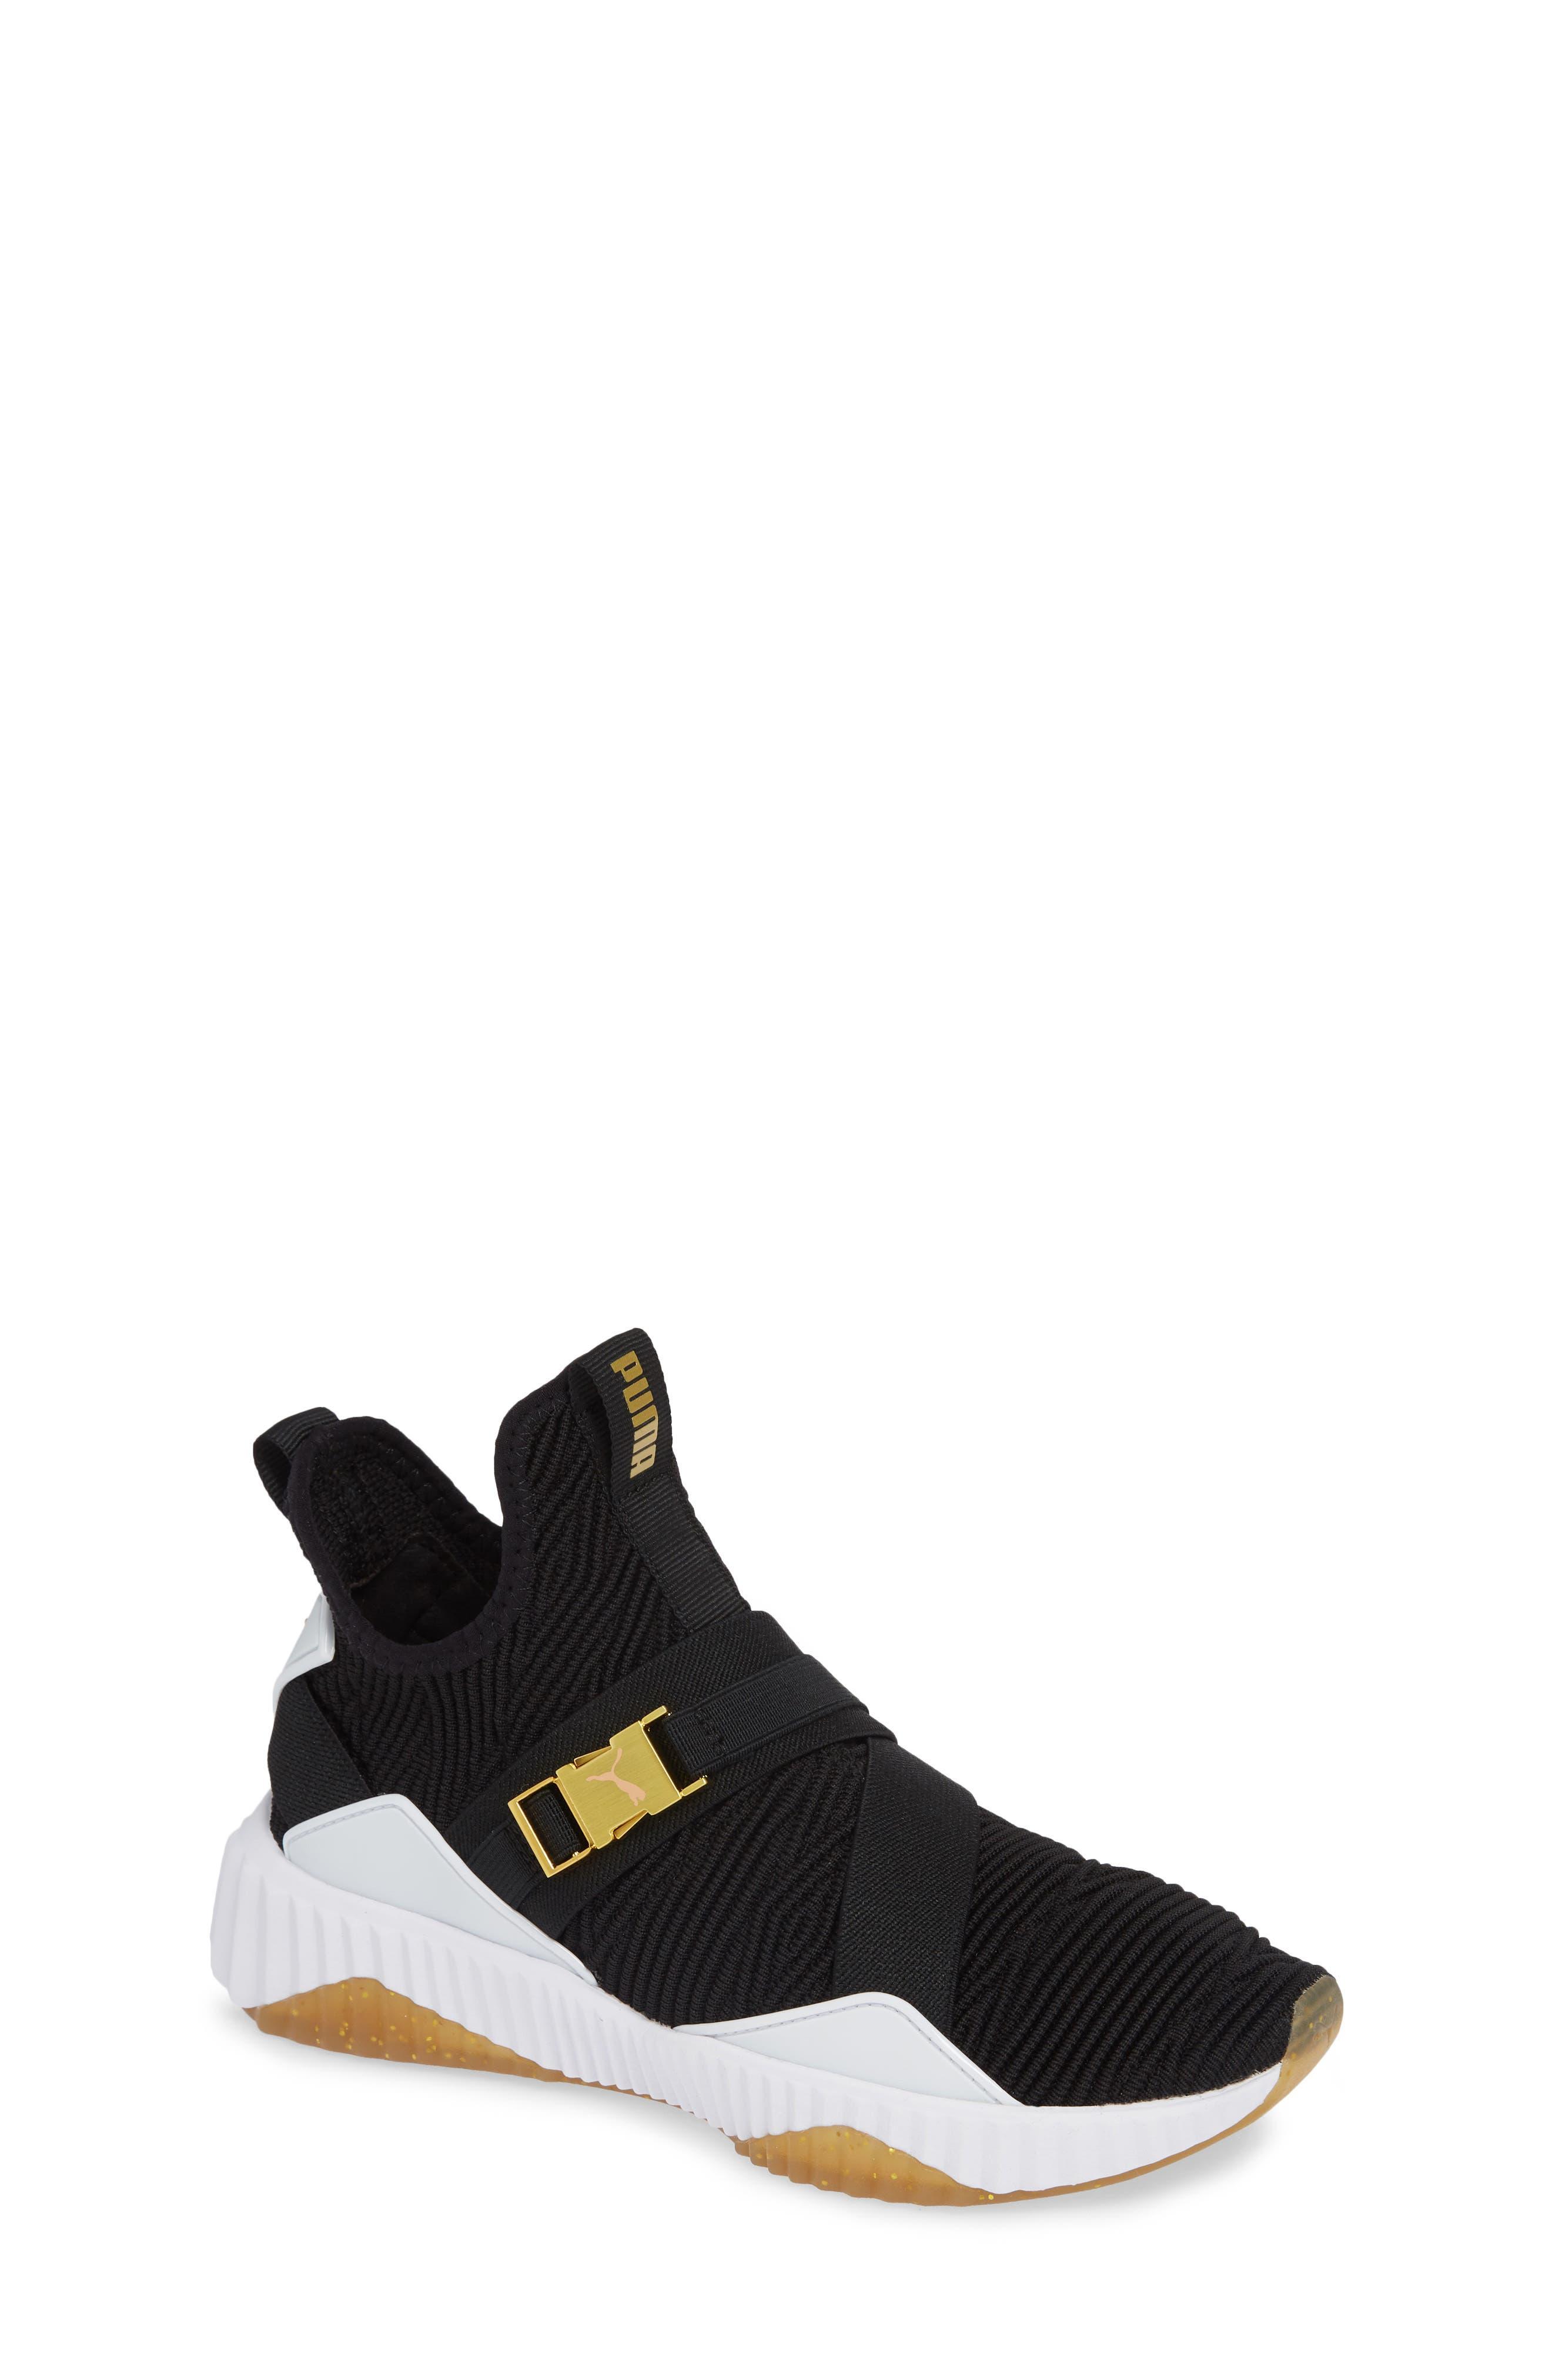 PUMA, Defy Mid Varsity Sneaker, Main thumbnail 1, color, BLACK/ METALLIC GOLD